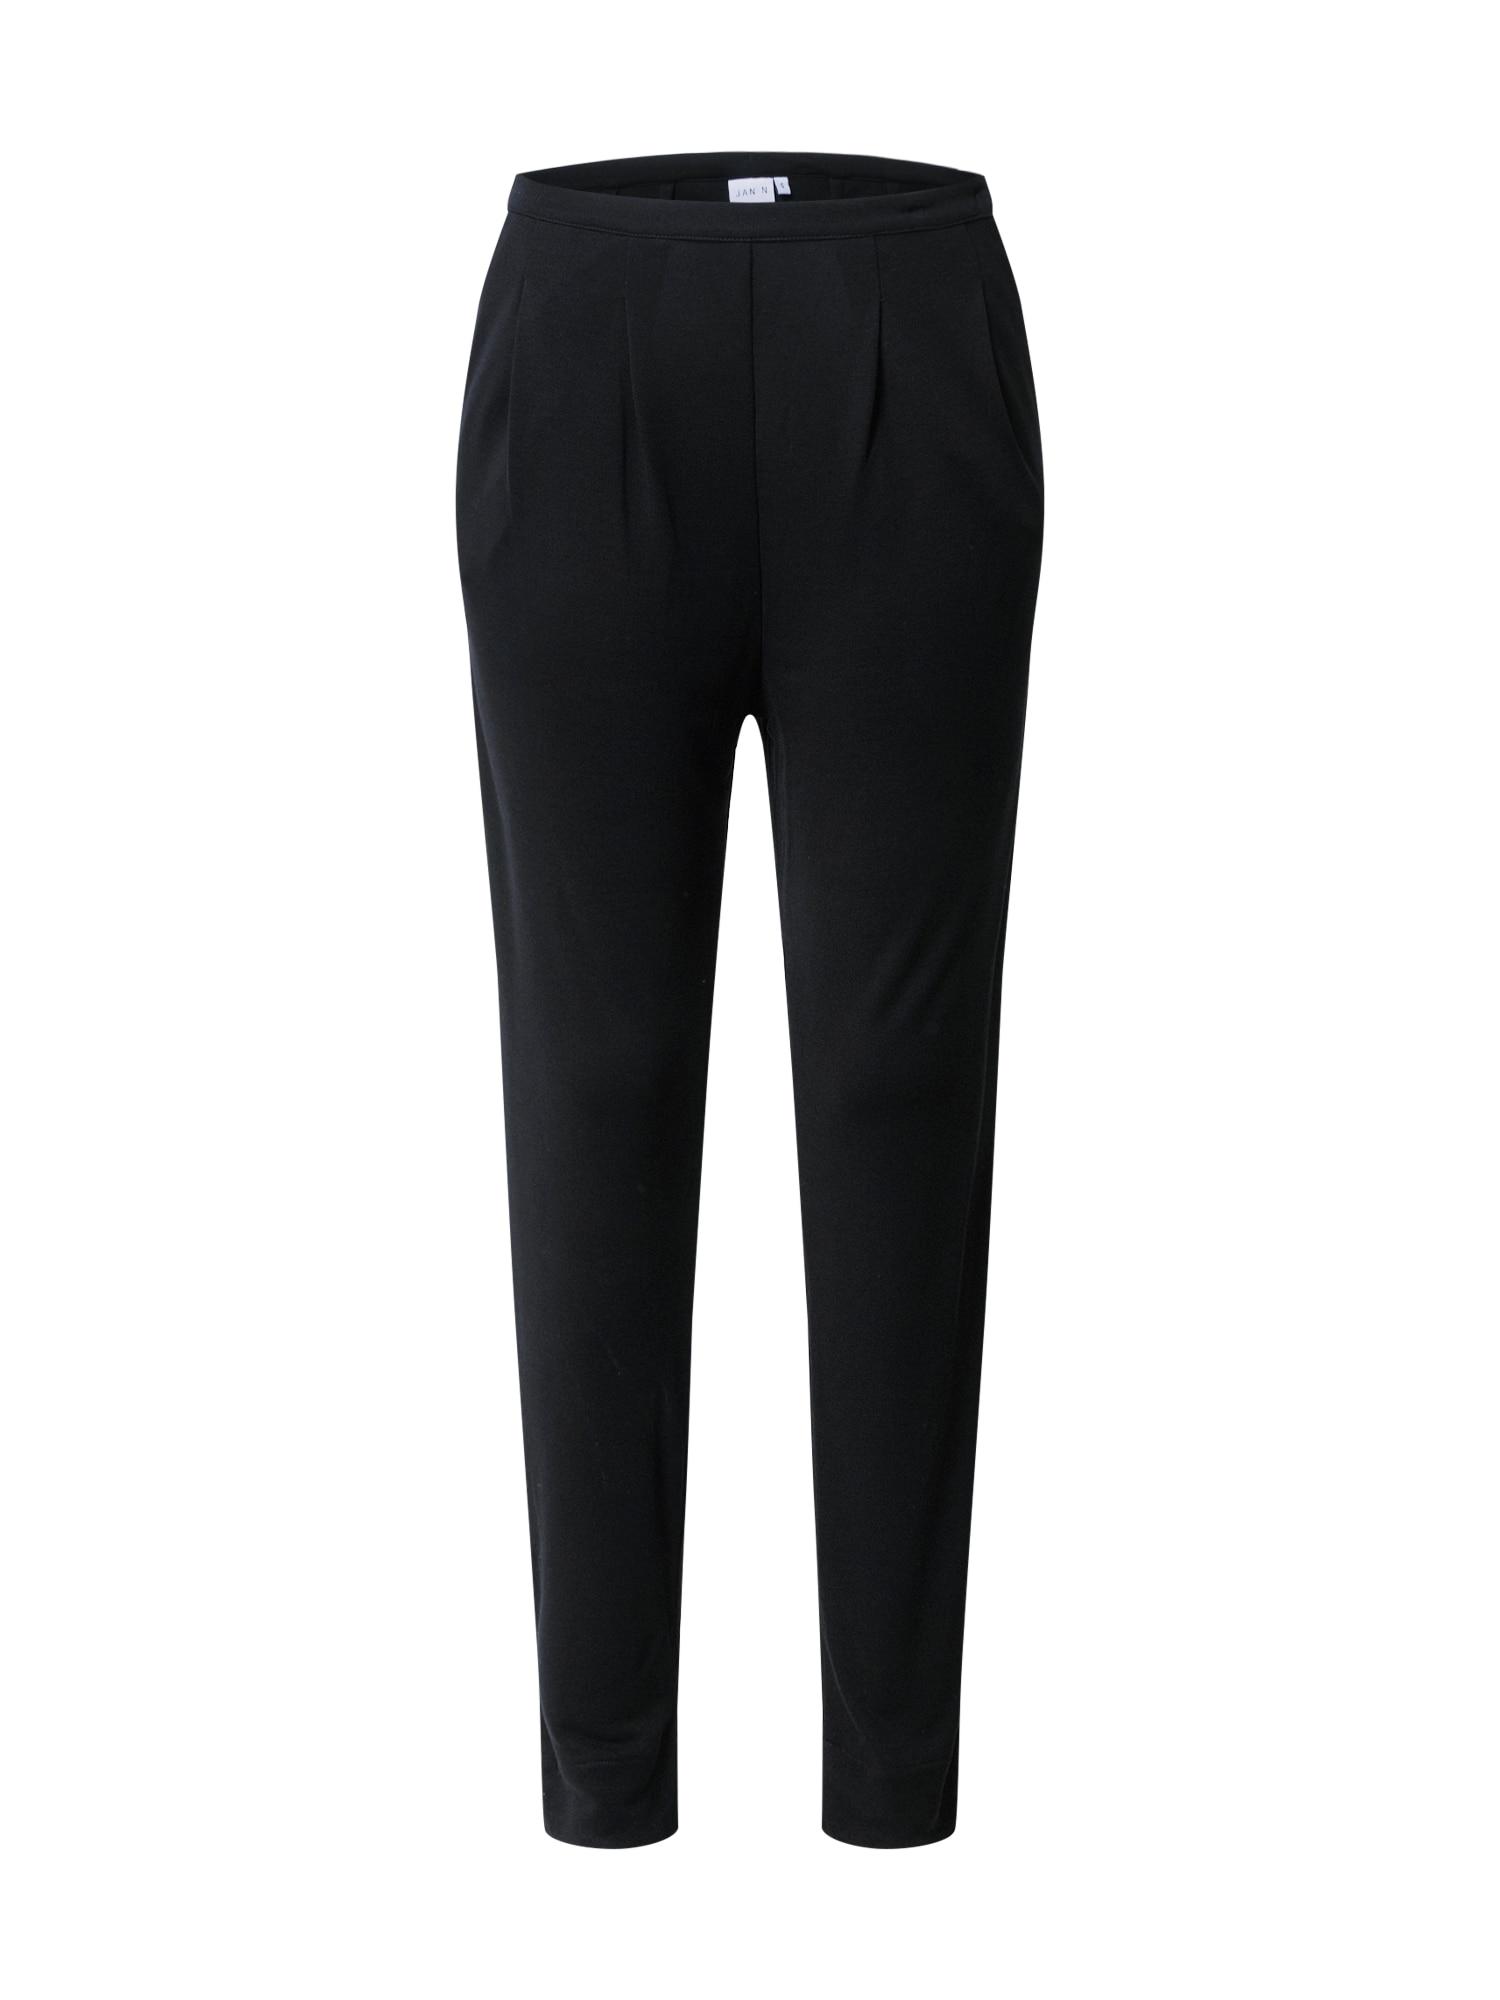 JAN 'N JUNE Plisované nohavice 'ARABIS'  čierna